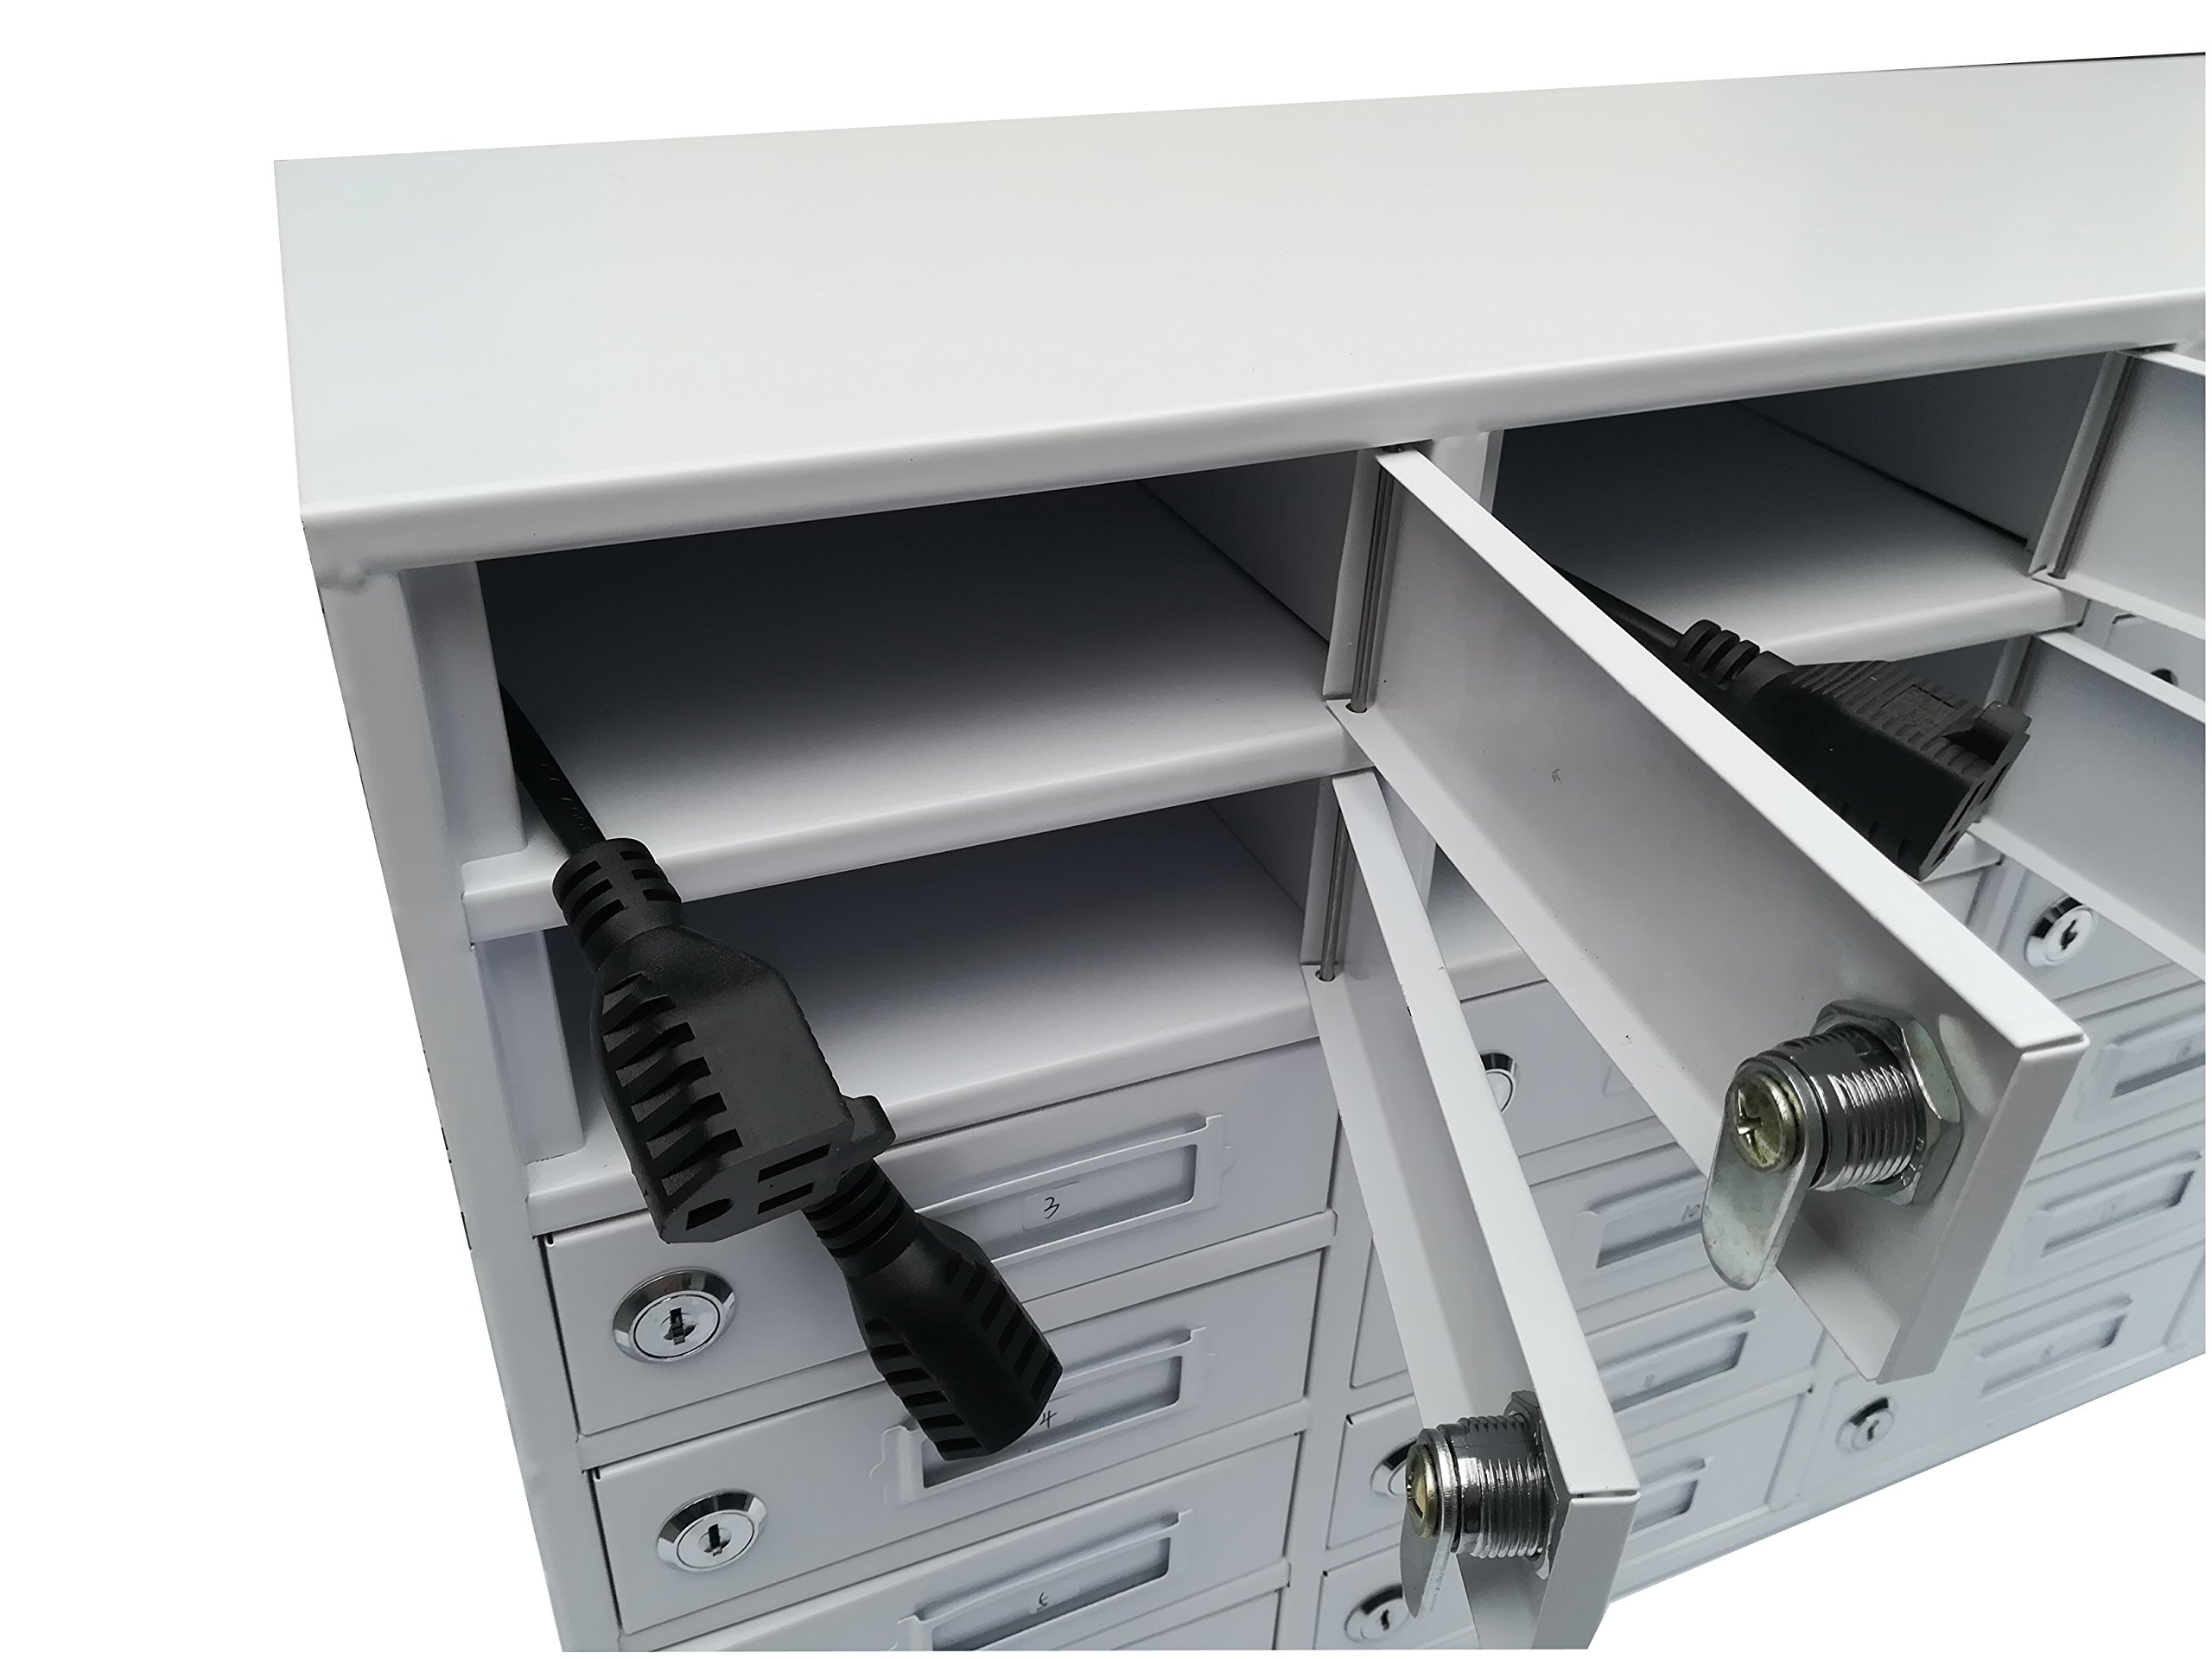 FixtureDisplays 30-Slot Cellphone iPad Mini Charging Station Locker Assignment Mail Slot Box 15252 by FixtureDisplays (Image #5)